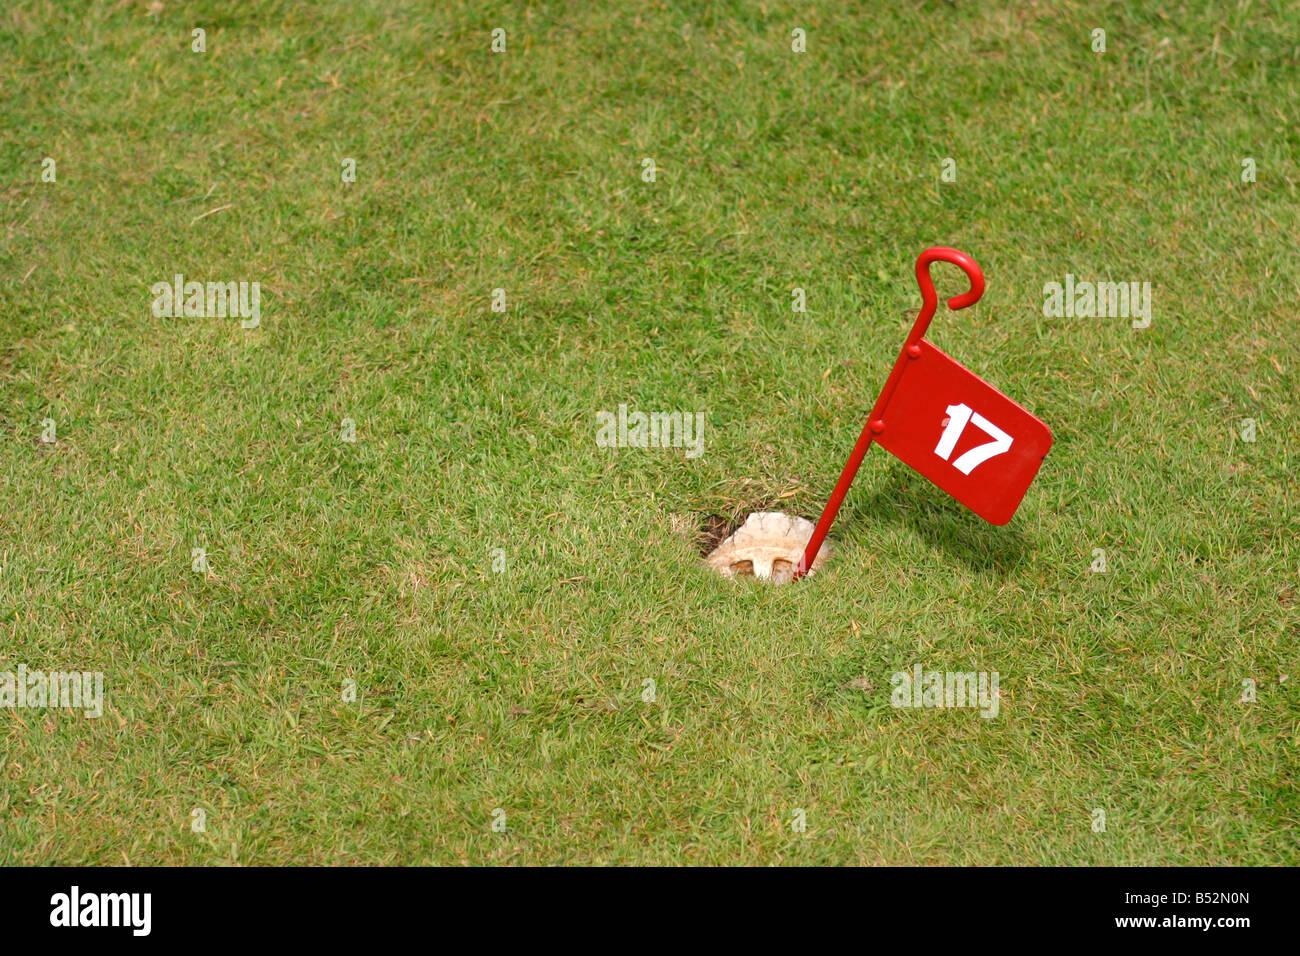 17 th golf hole flag - Stock Image